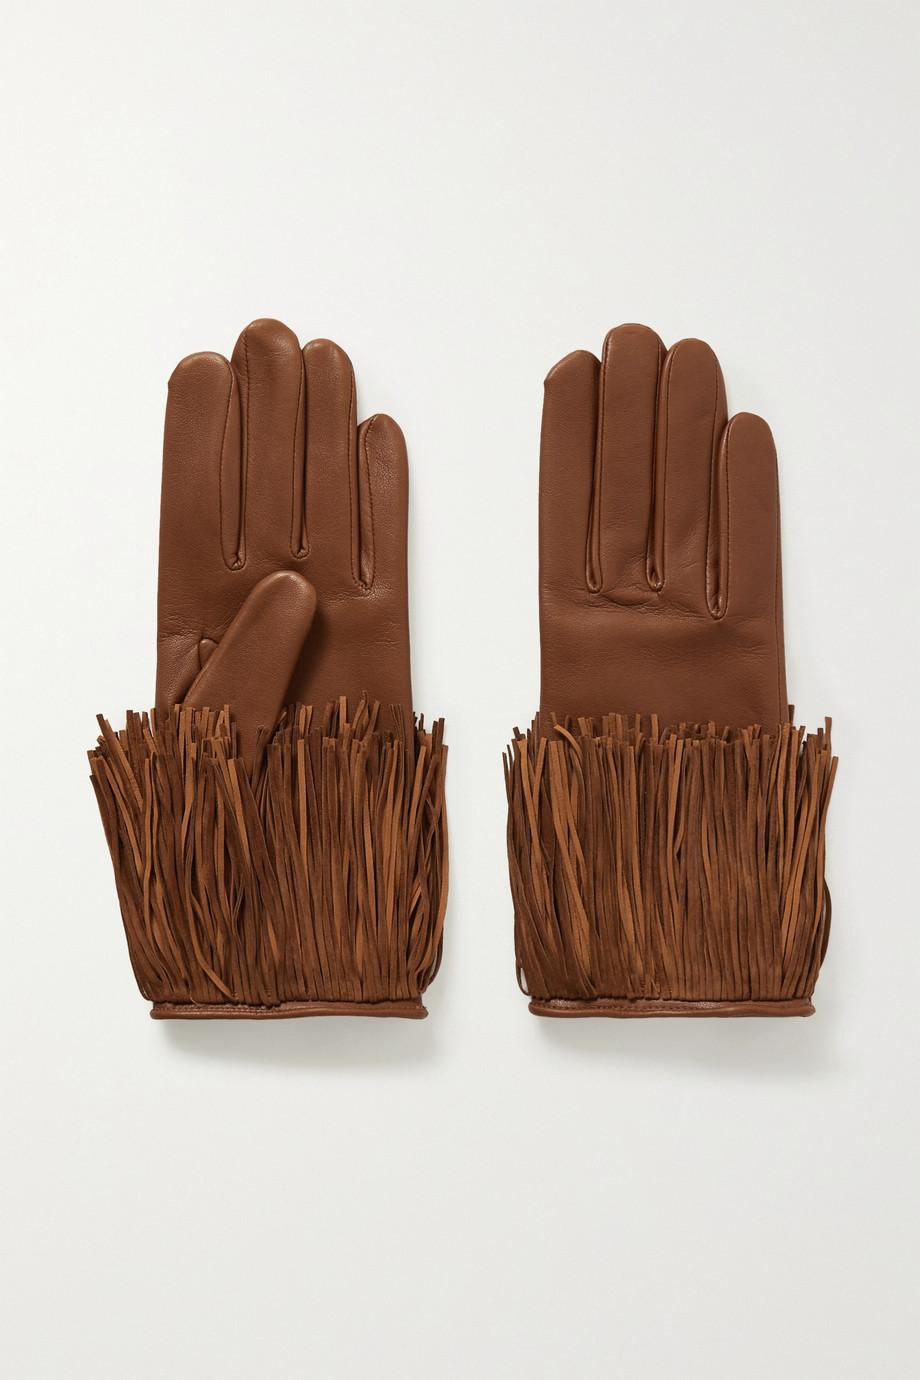 Agnelle Lena fringed leather gloves